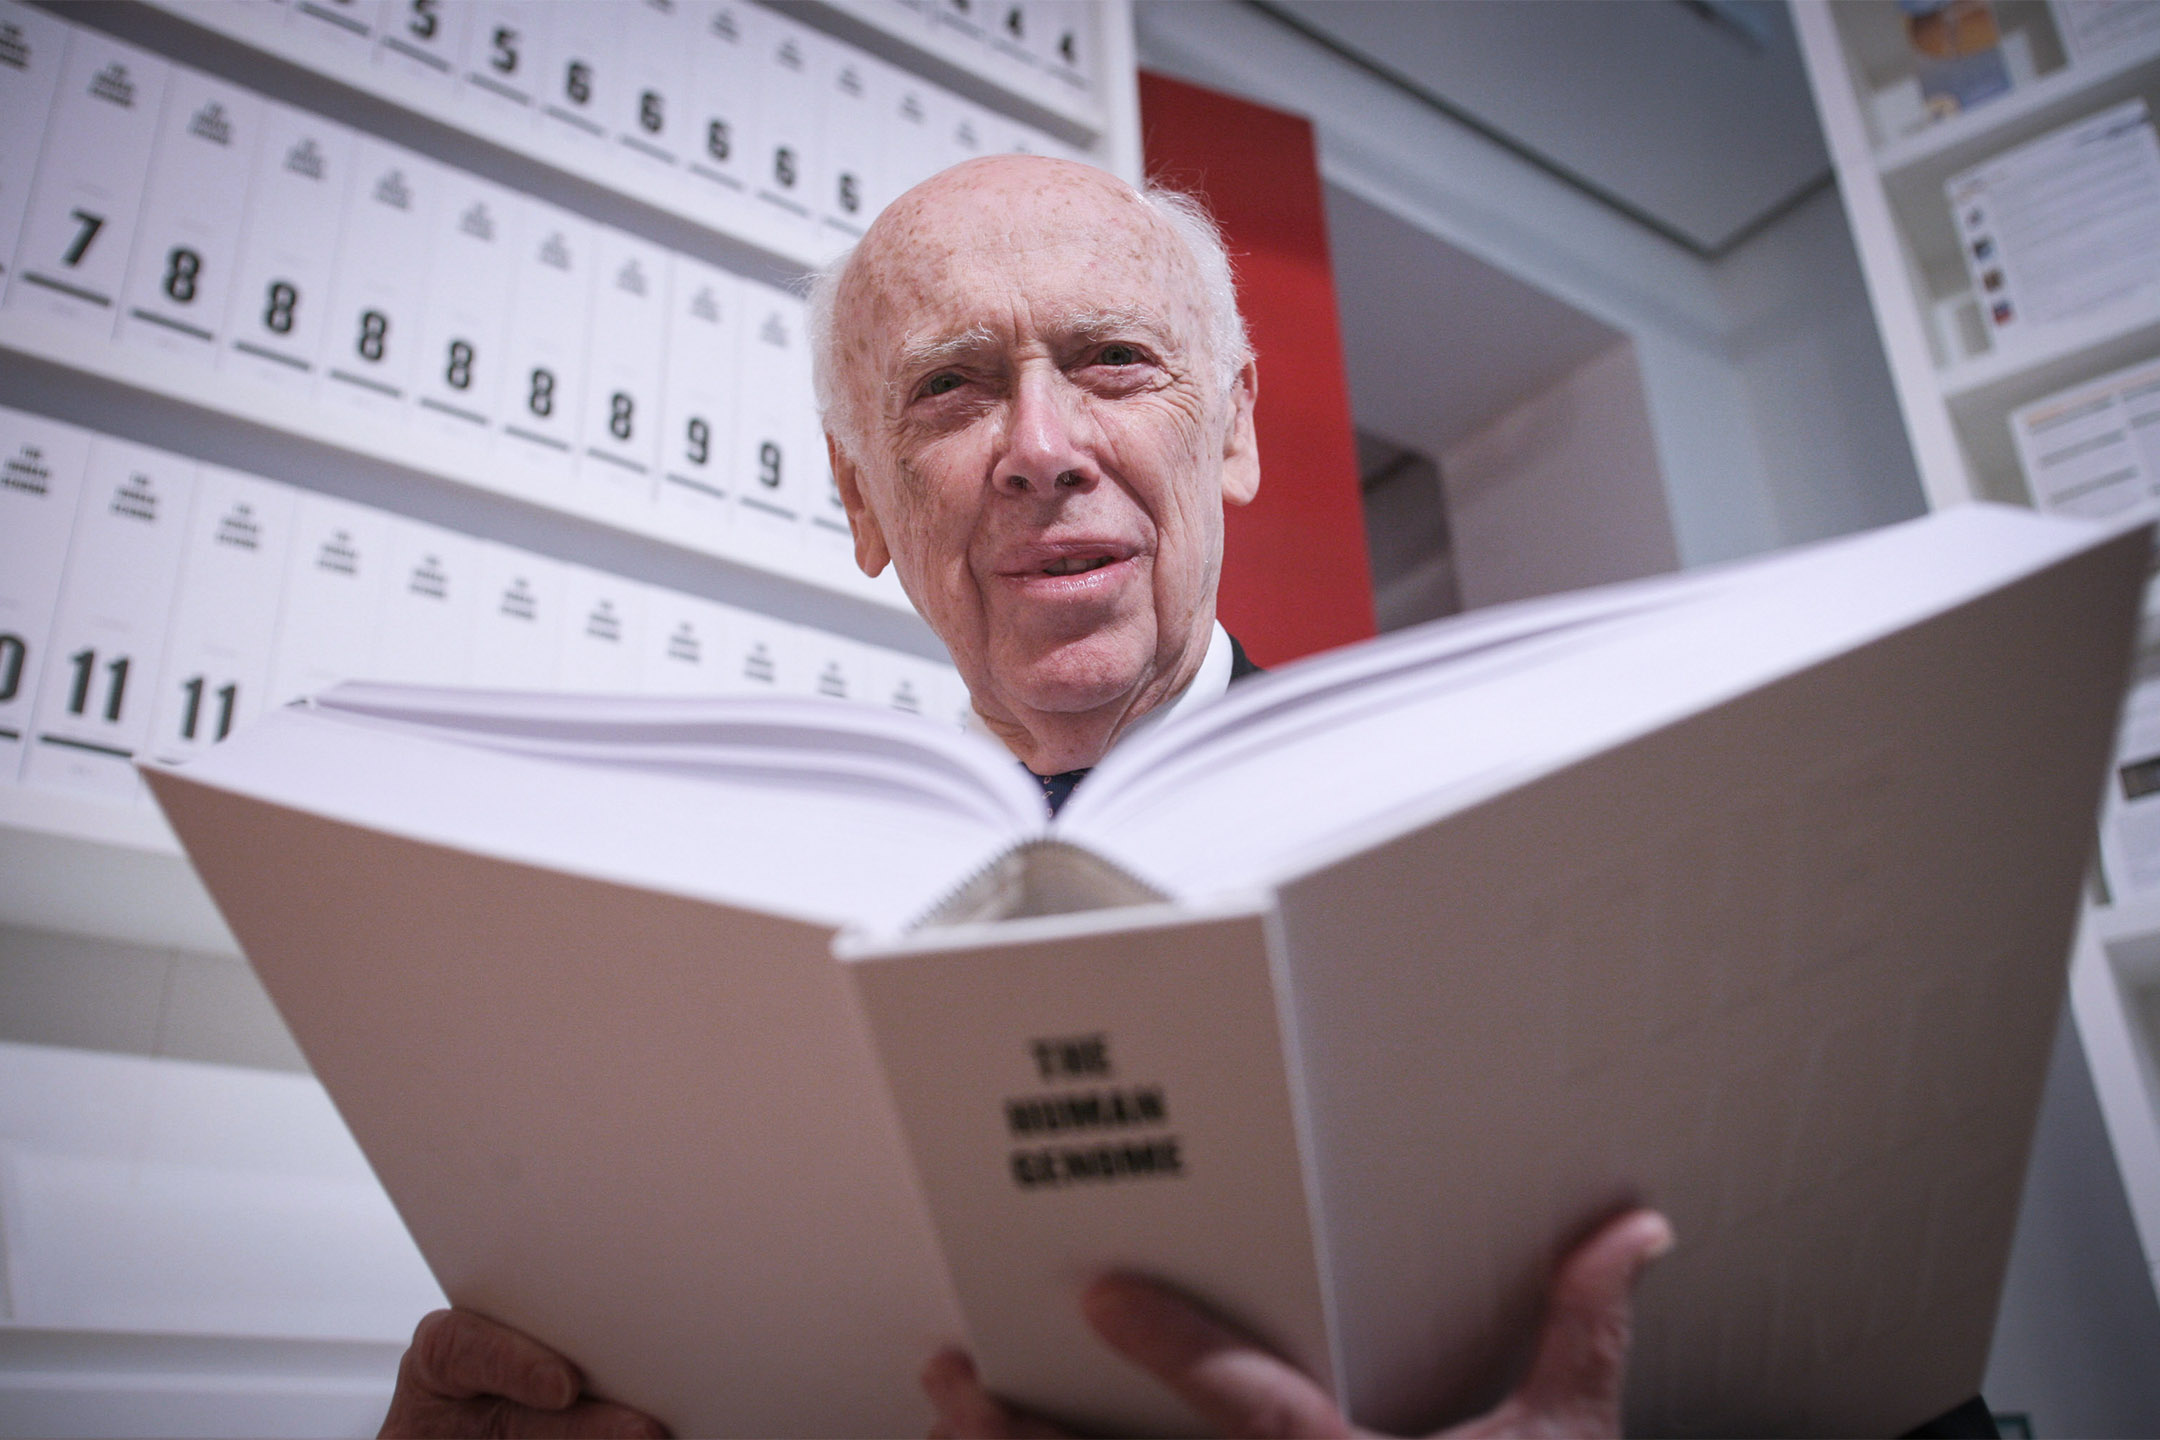 諾貝爾獎生理及醫學獎得主詹姆斯·沃森 James Dewey Watson。 攝:Graham Barclay/Bloomberg via Getty Images